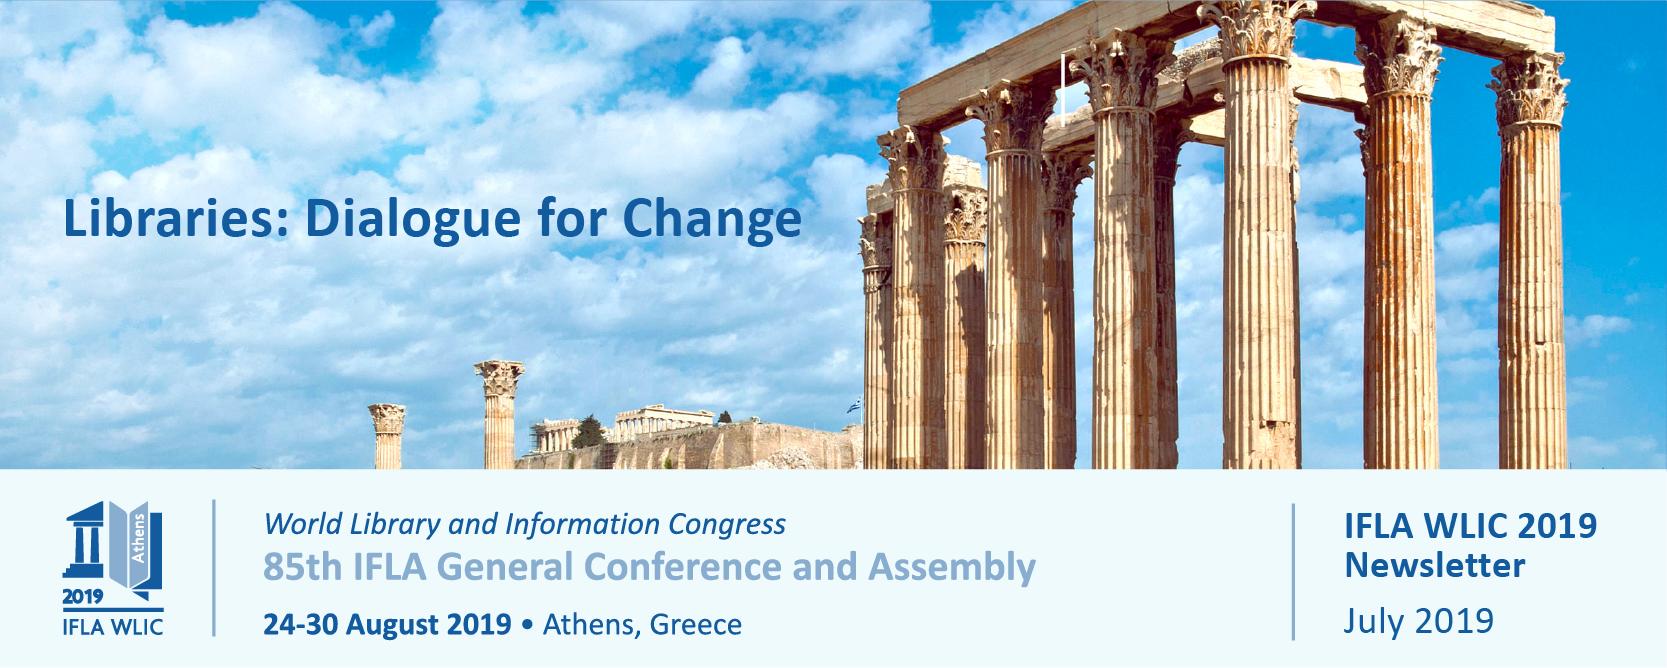 Congress newsletter header image